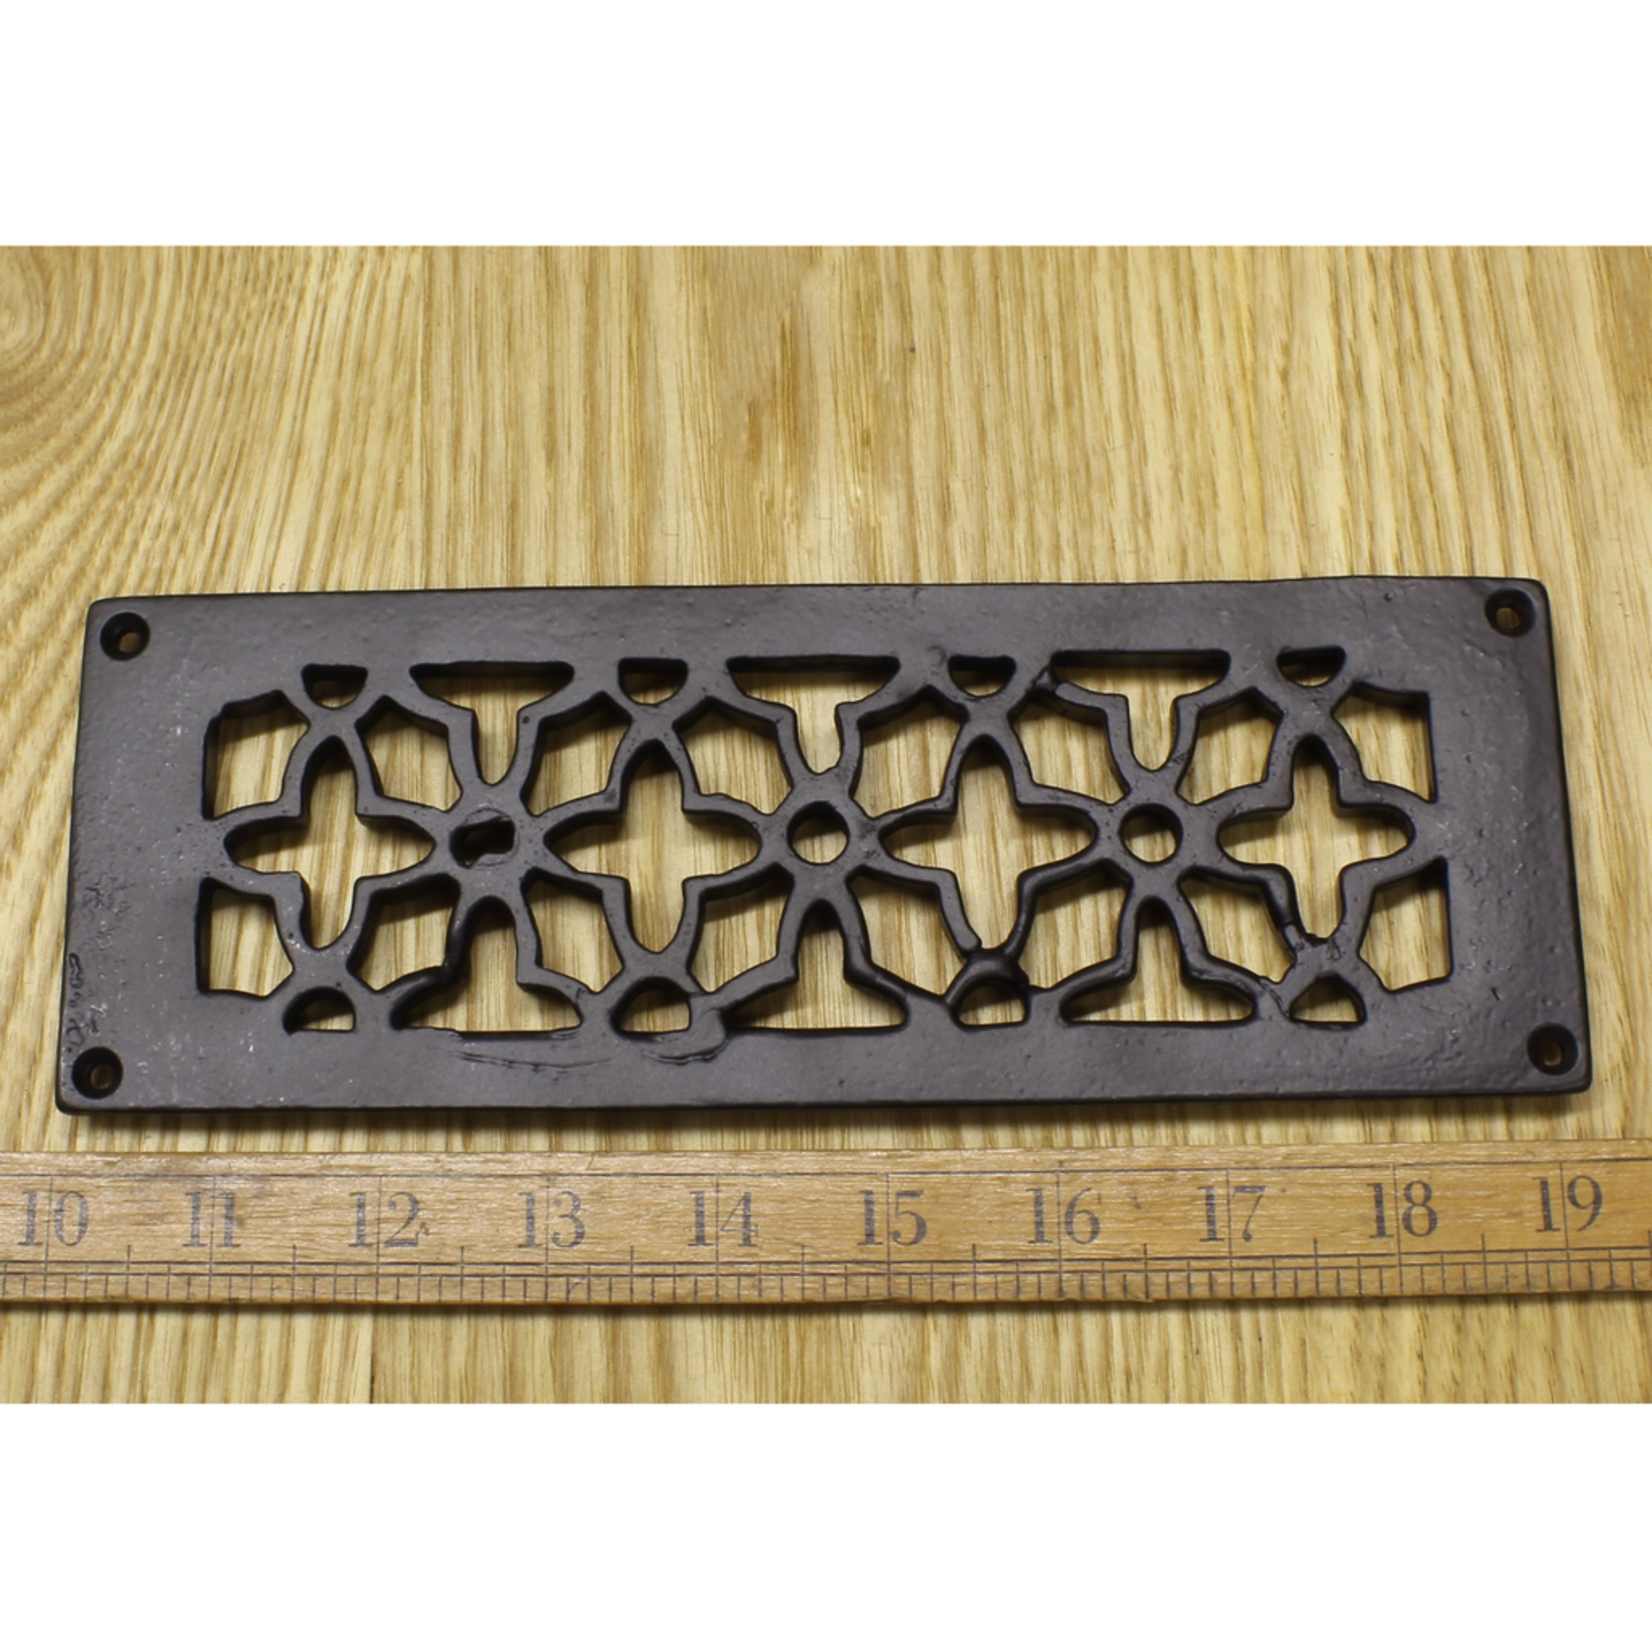 "IRON RANGE Air Vent (Air Brick) Rebated Satin Epoxy Black 3.25"" x 9"""